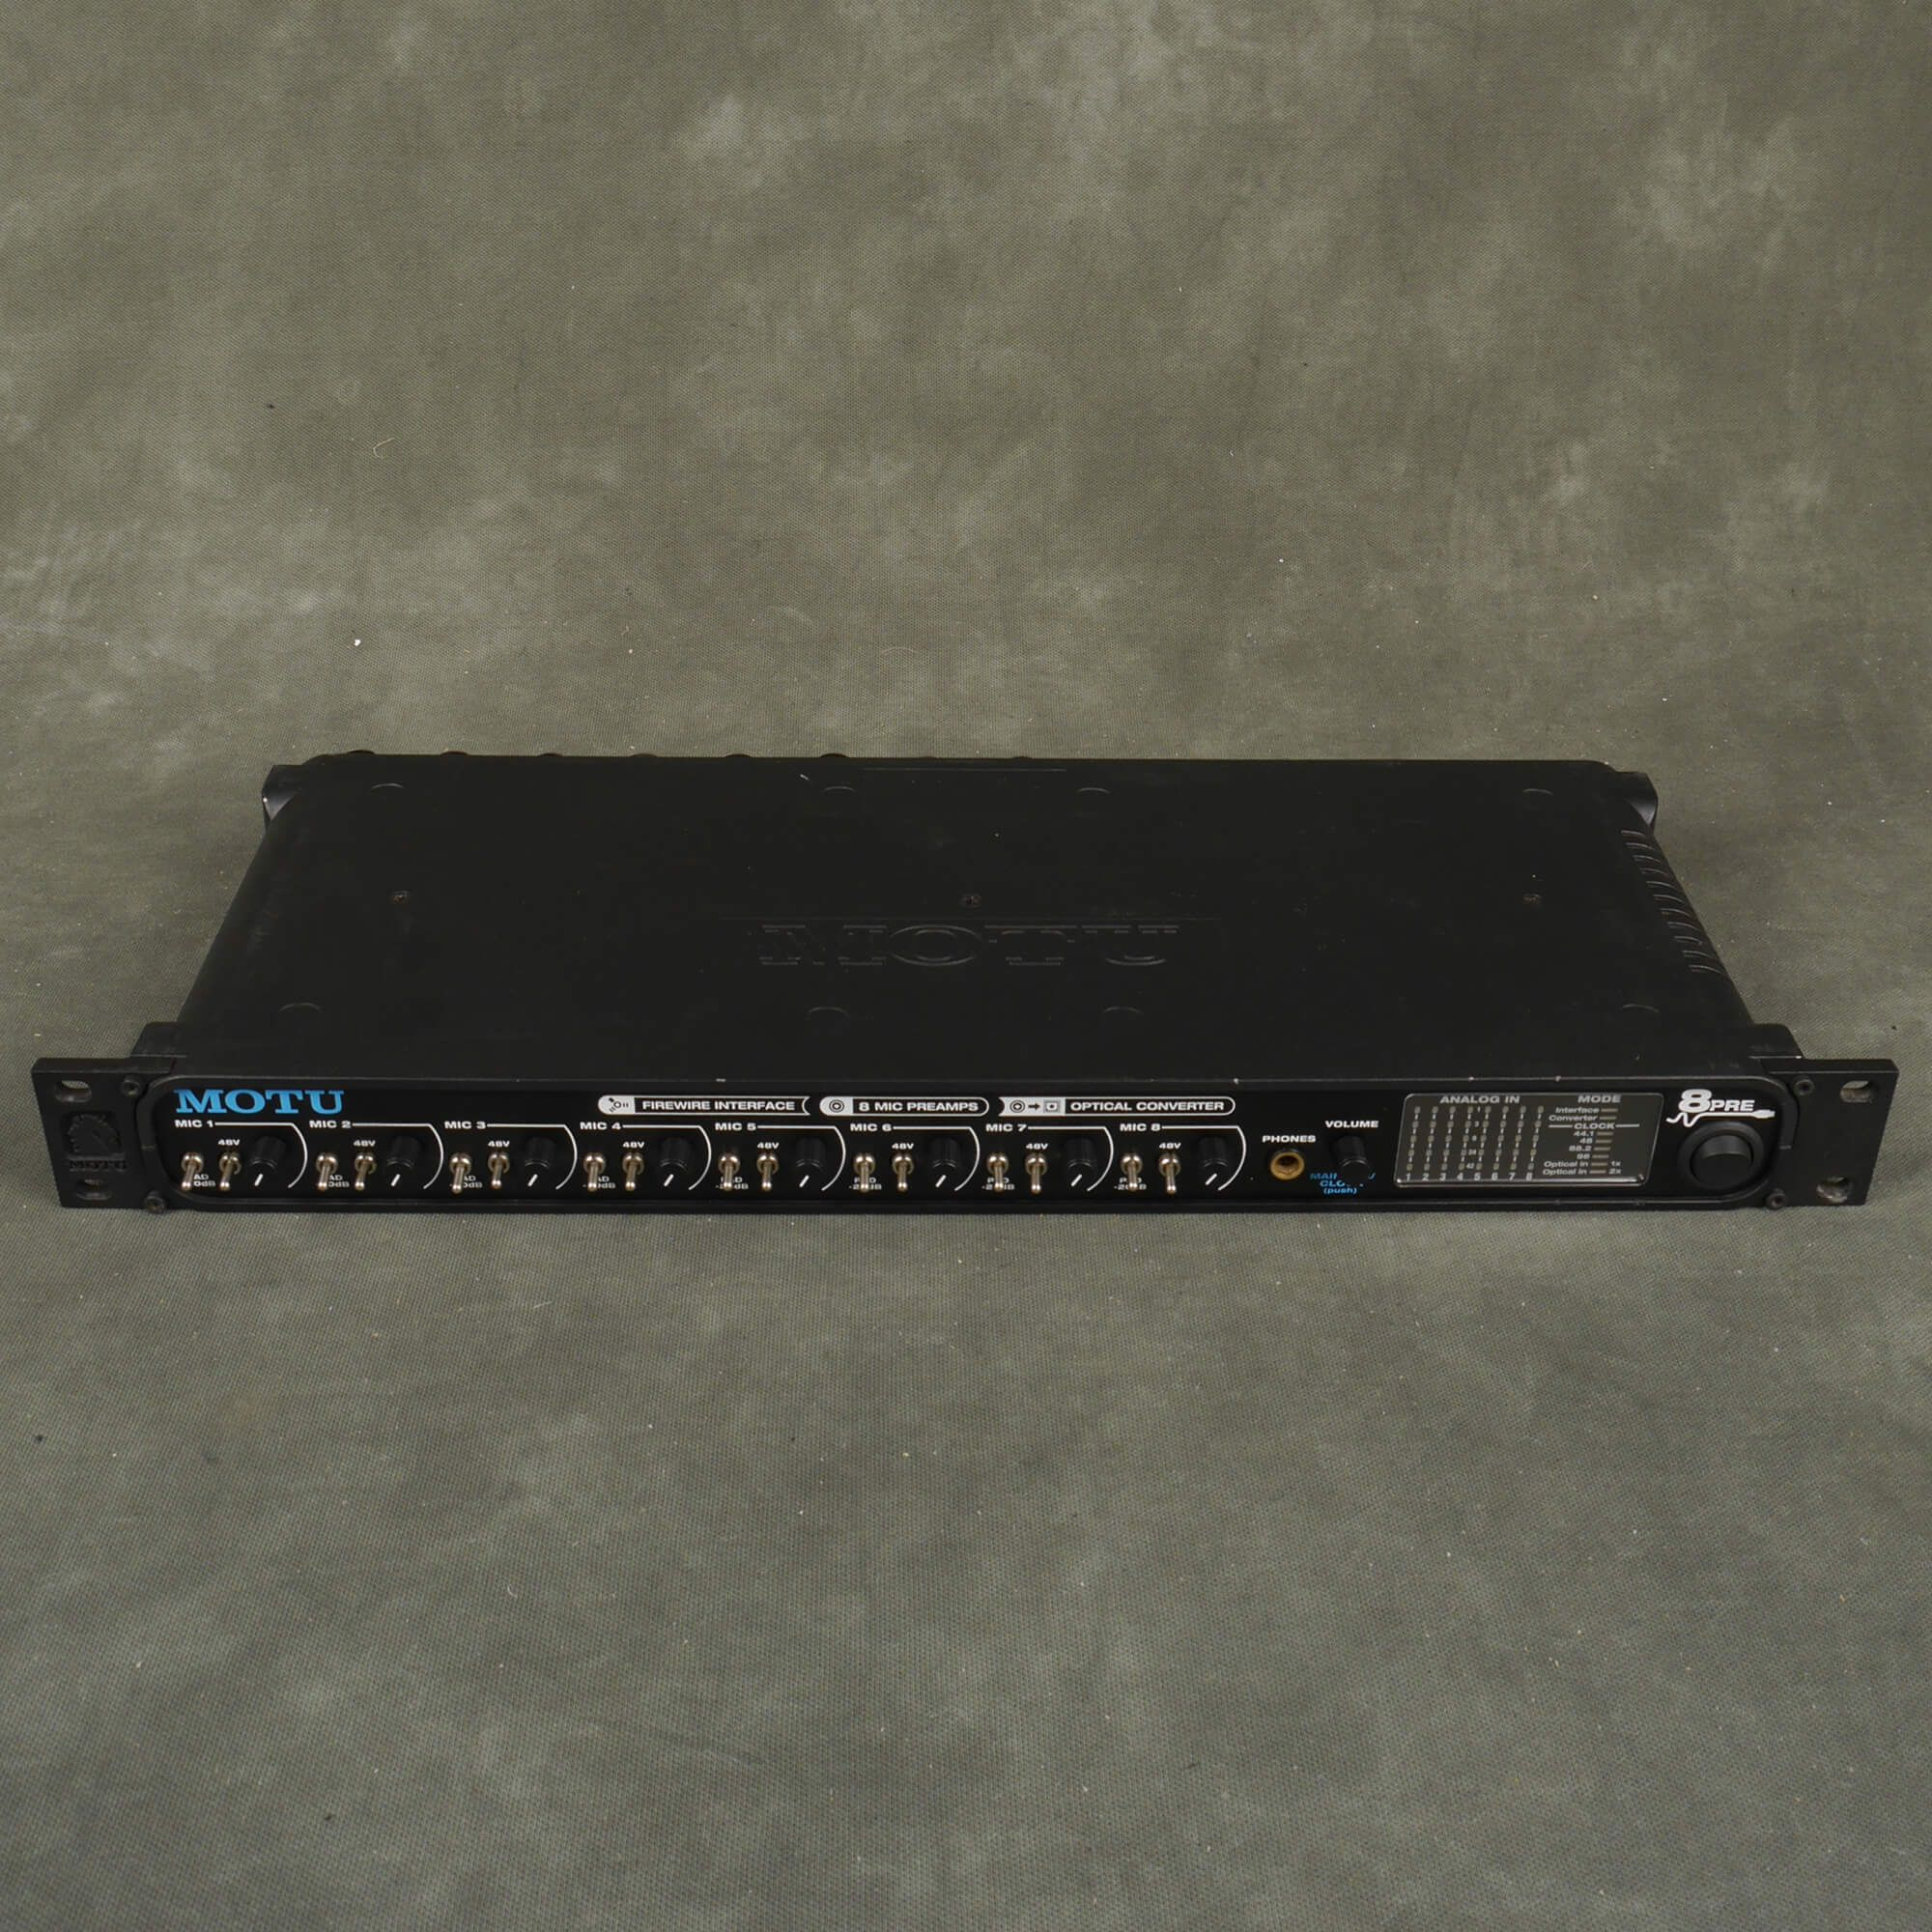 MOTU 8 Pre Audio Interface - 2nd Hand